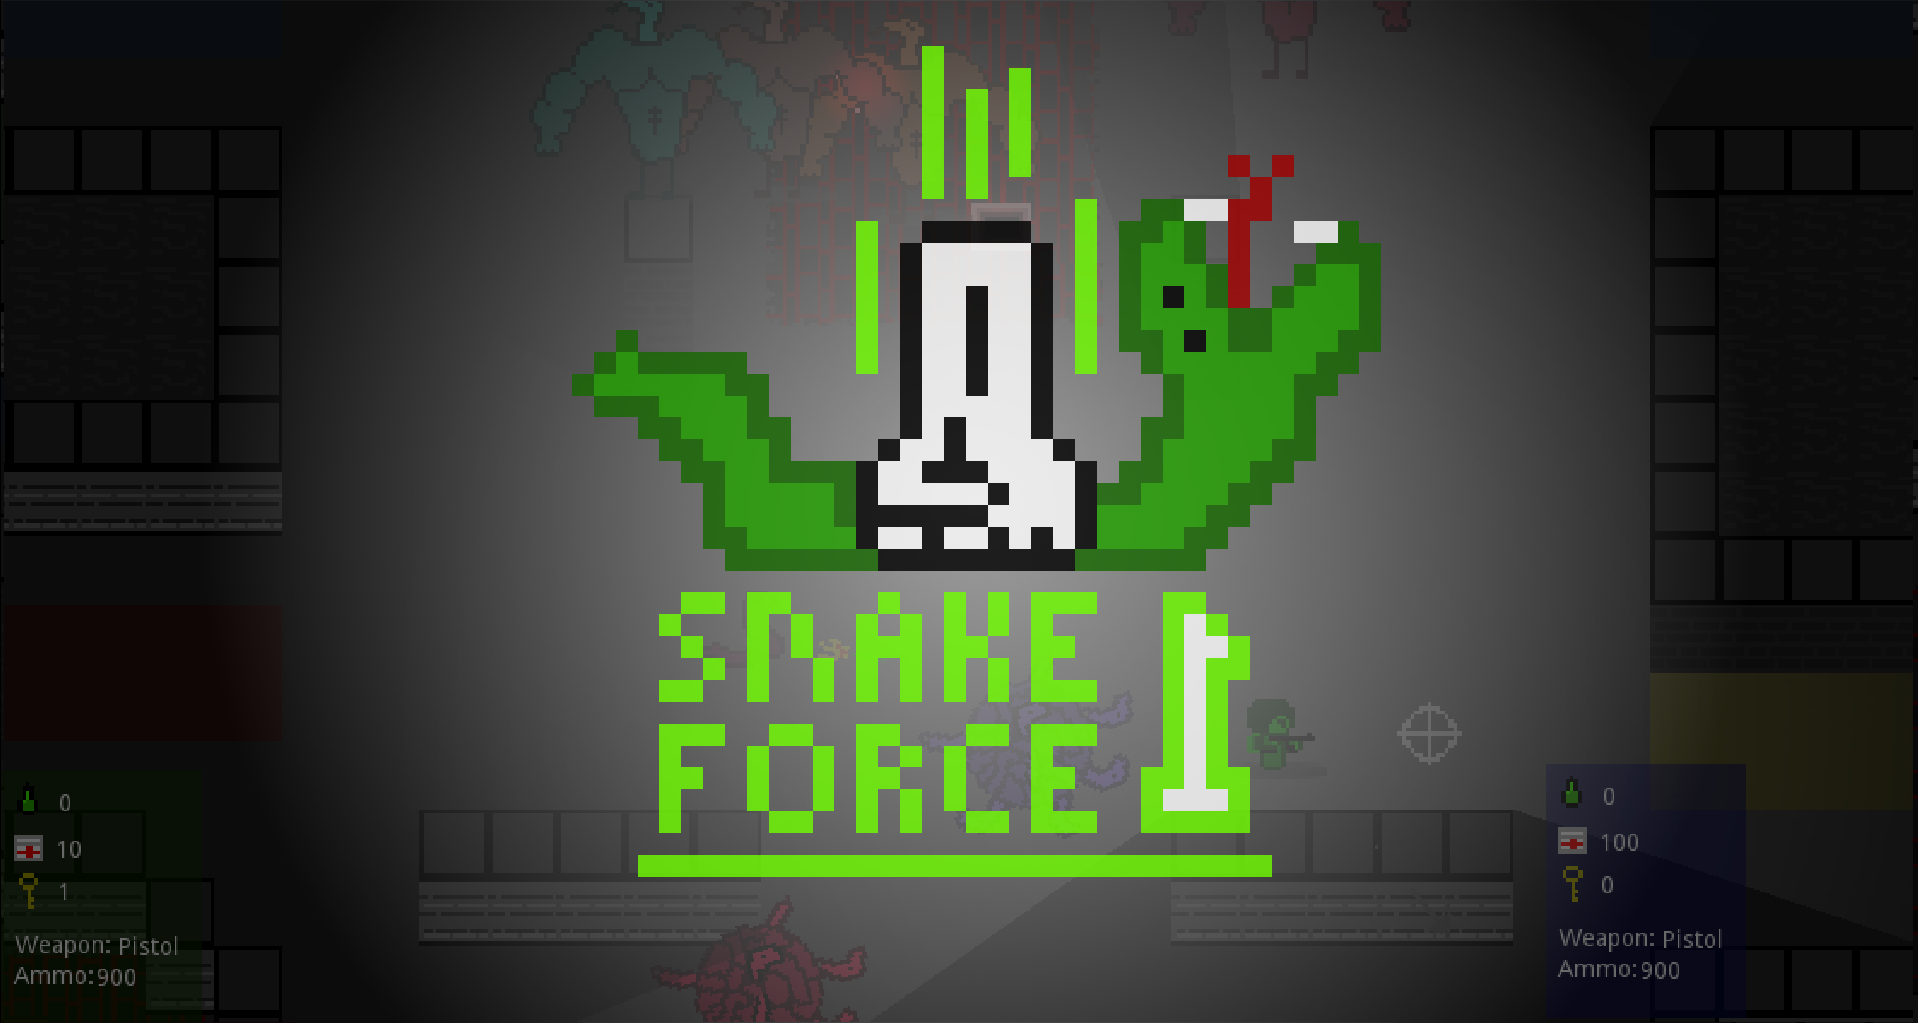 SnakeForce1